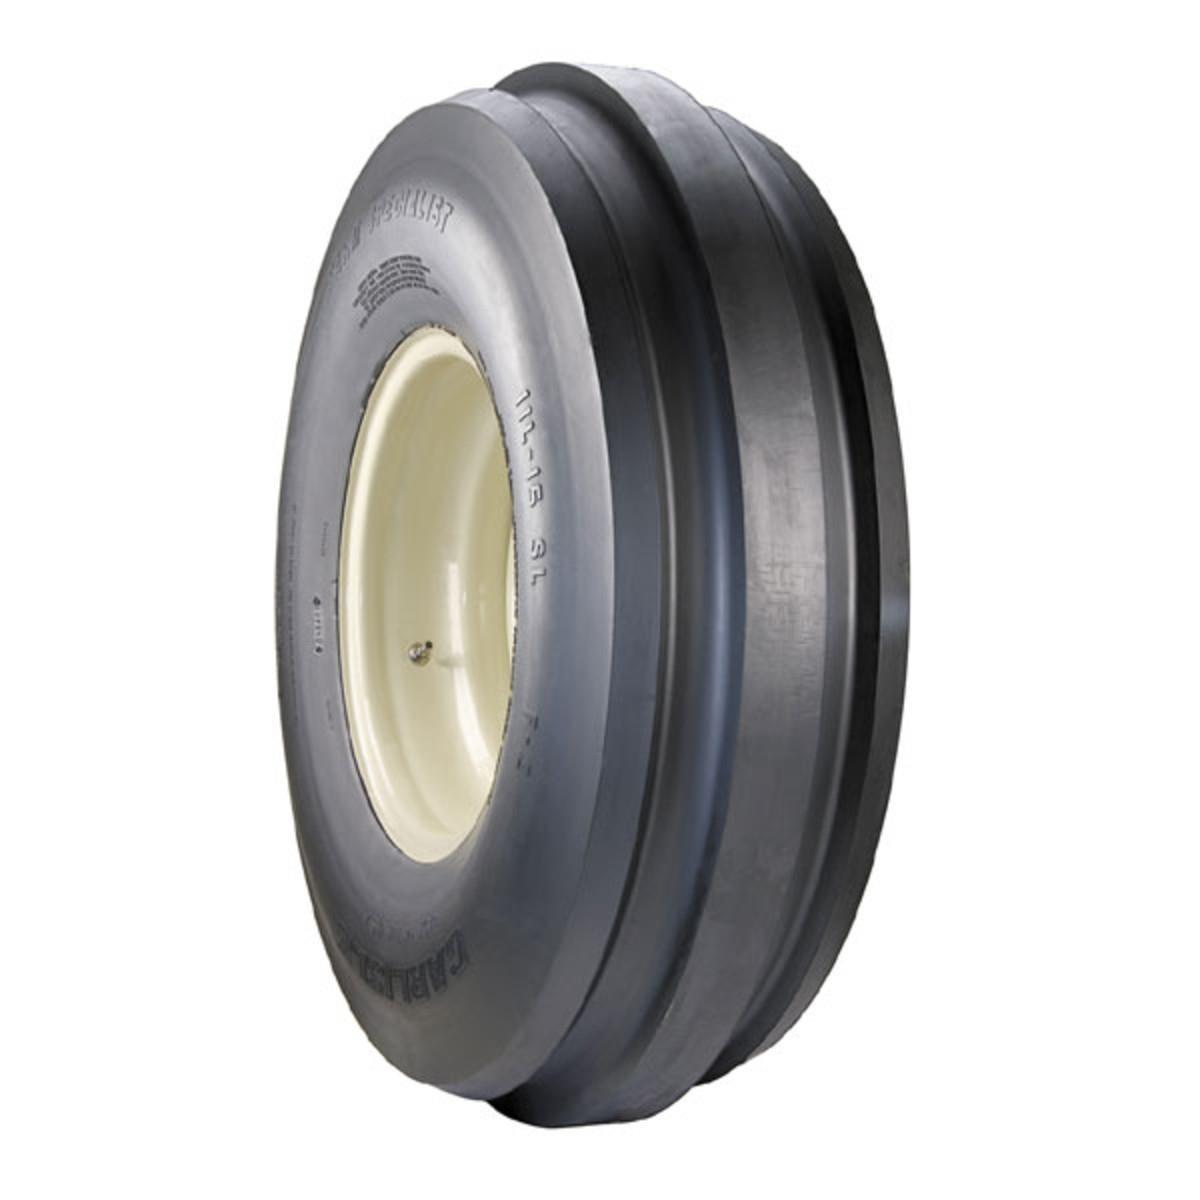 Carlisle 11.00-16 Wheels / Tires / Track